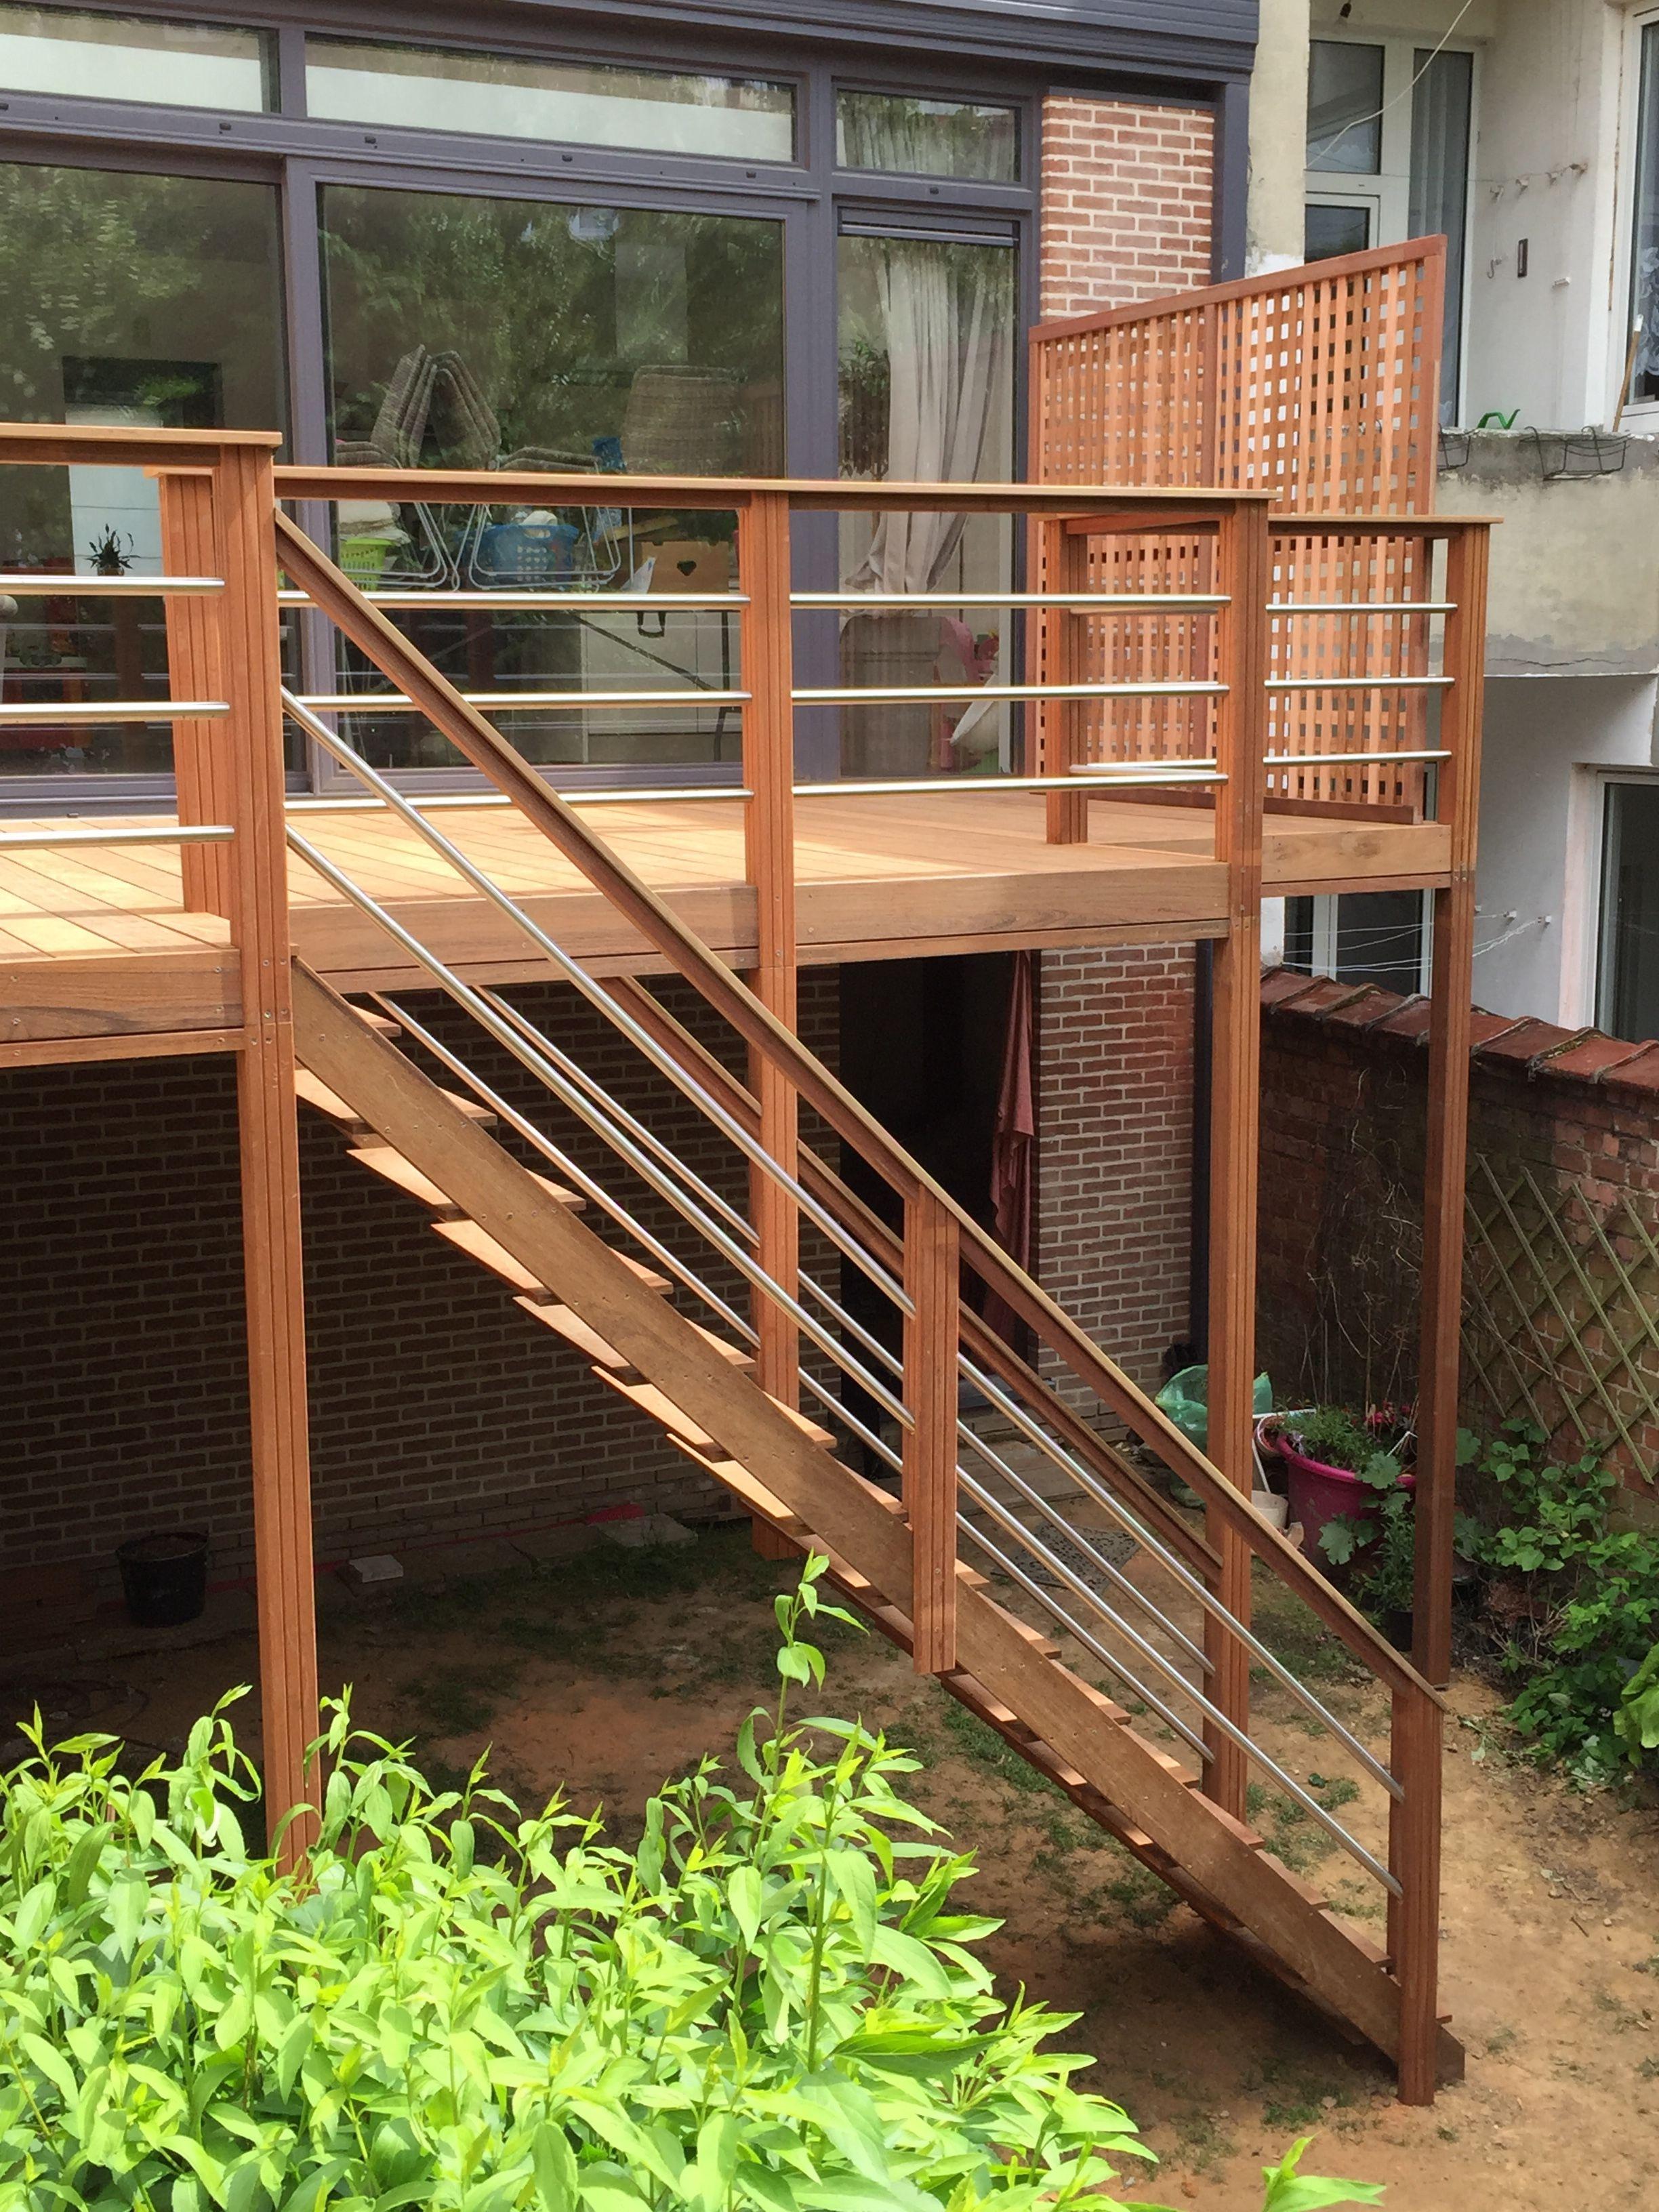 terrasses suspendues les sens du bois am nagement jardin pinterest balkon wintergarten. Black Bedroom Furniture Sets. Home Design Ideas